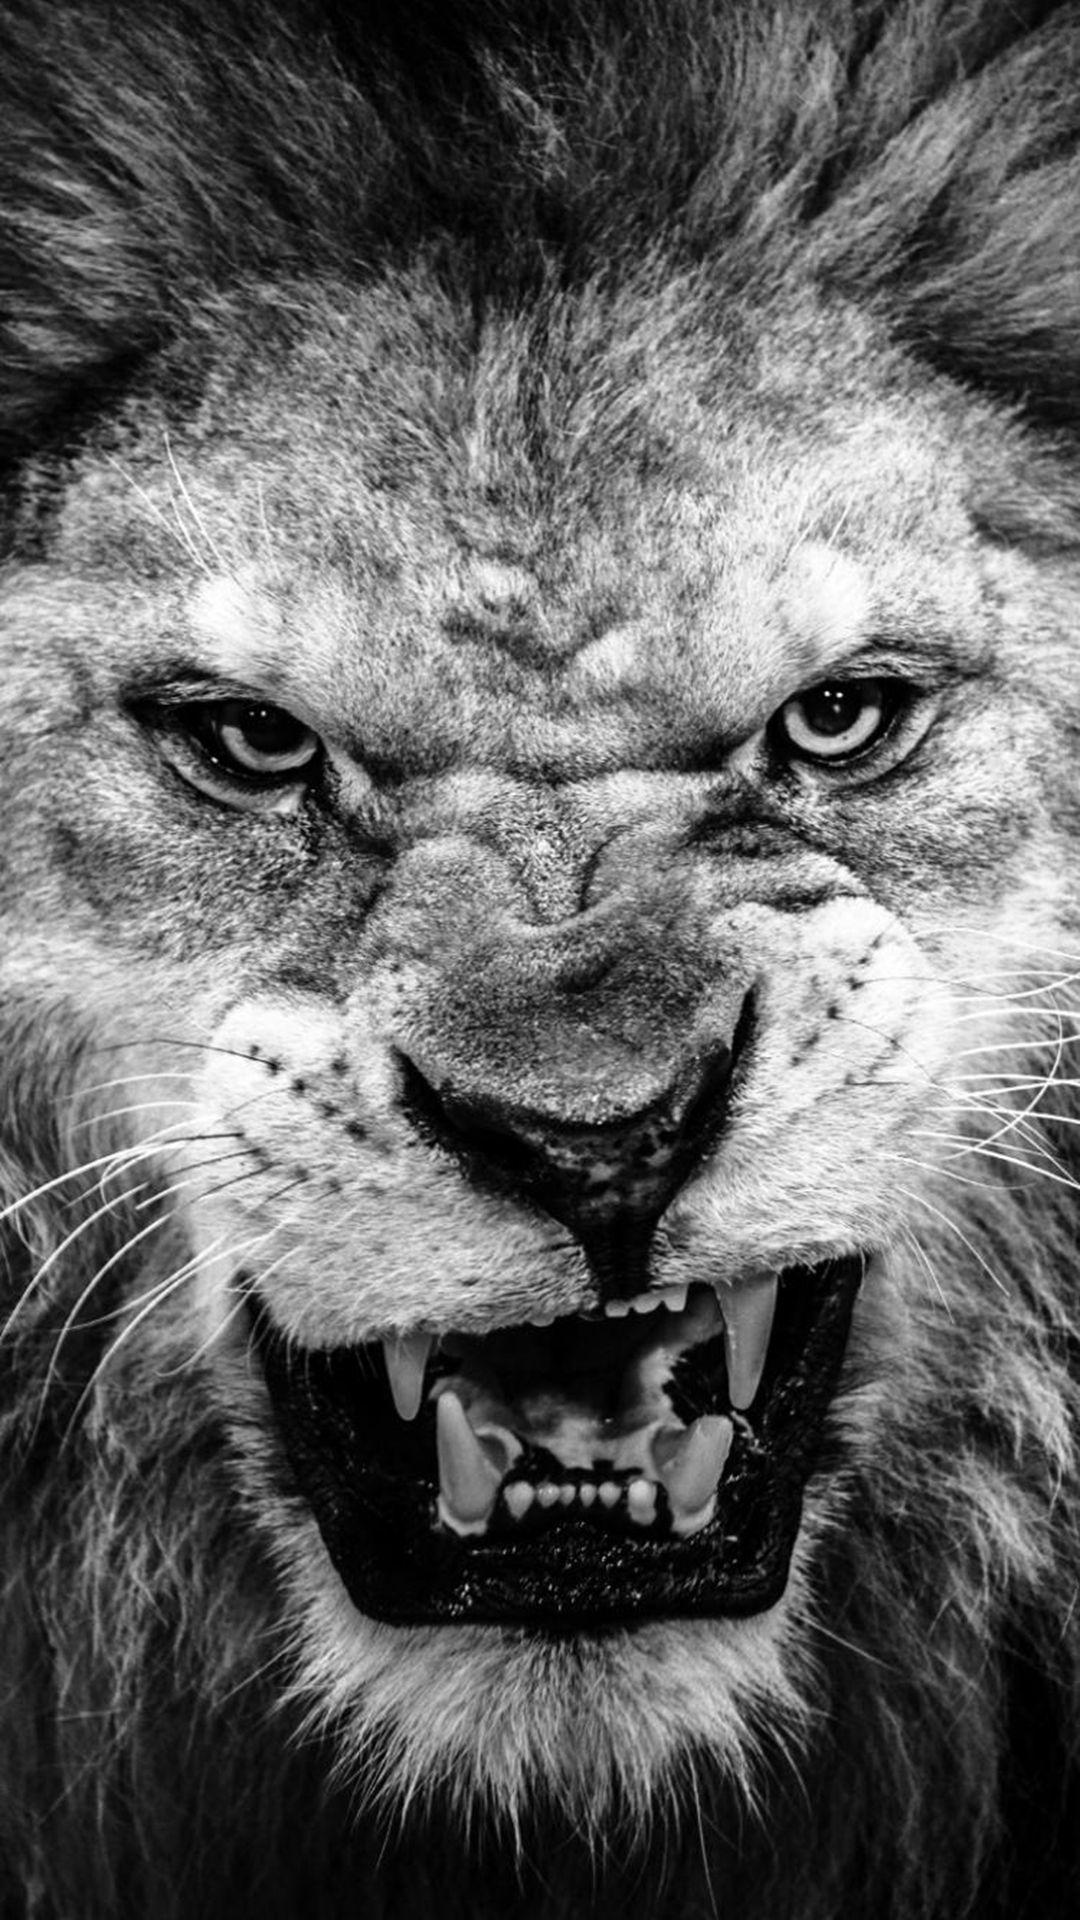 Iphone wallpaper tumblr lion - Dark Fierce Lion Face Macro Iphone 6 Wallpaper